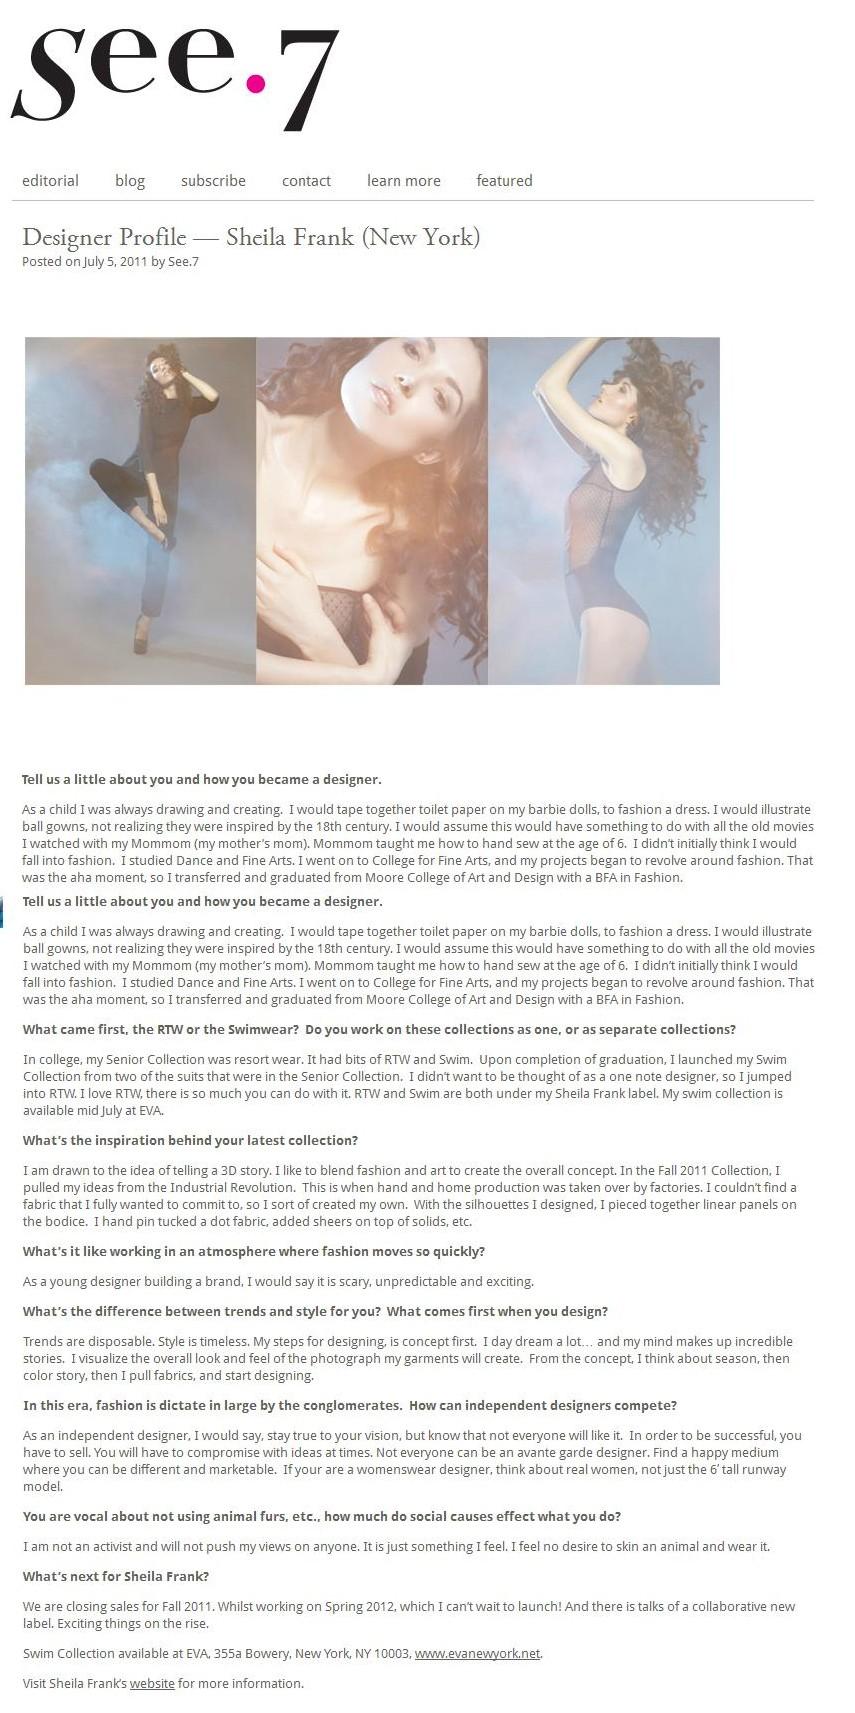 see7.com 2011 article.jpg